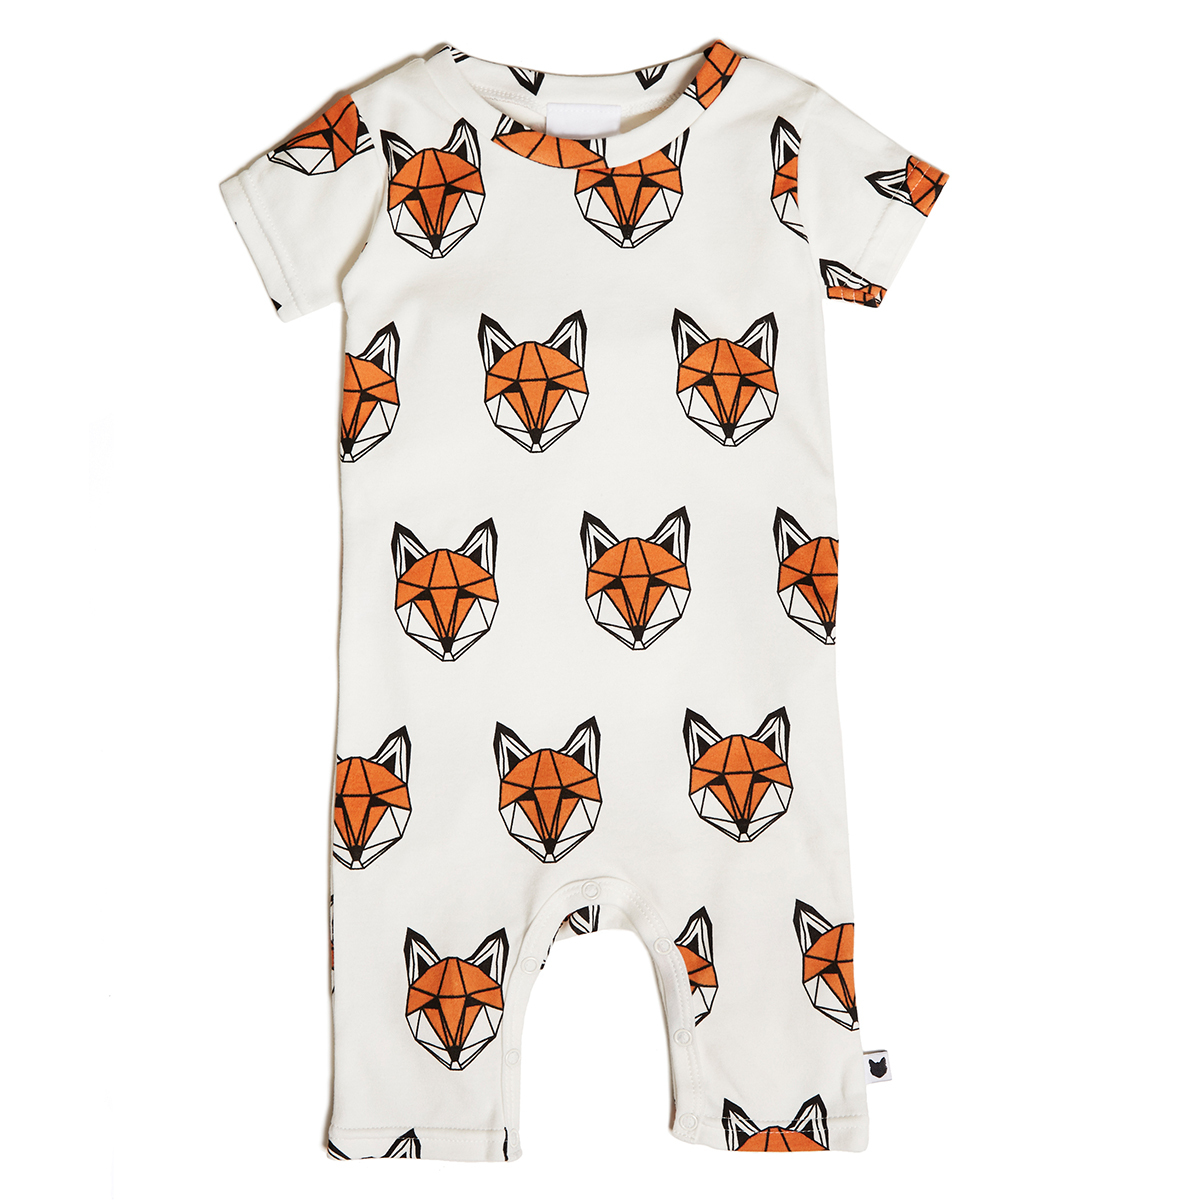 Robe & combinaison Combinaison Just Call Me Fox - 18/24 Mois Combinaison Just Call Me Fox - 18/24 Mois